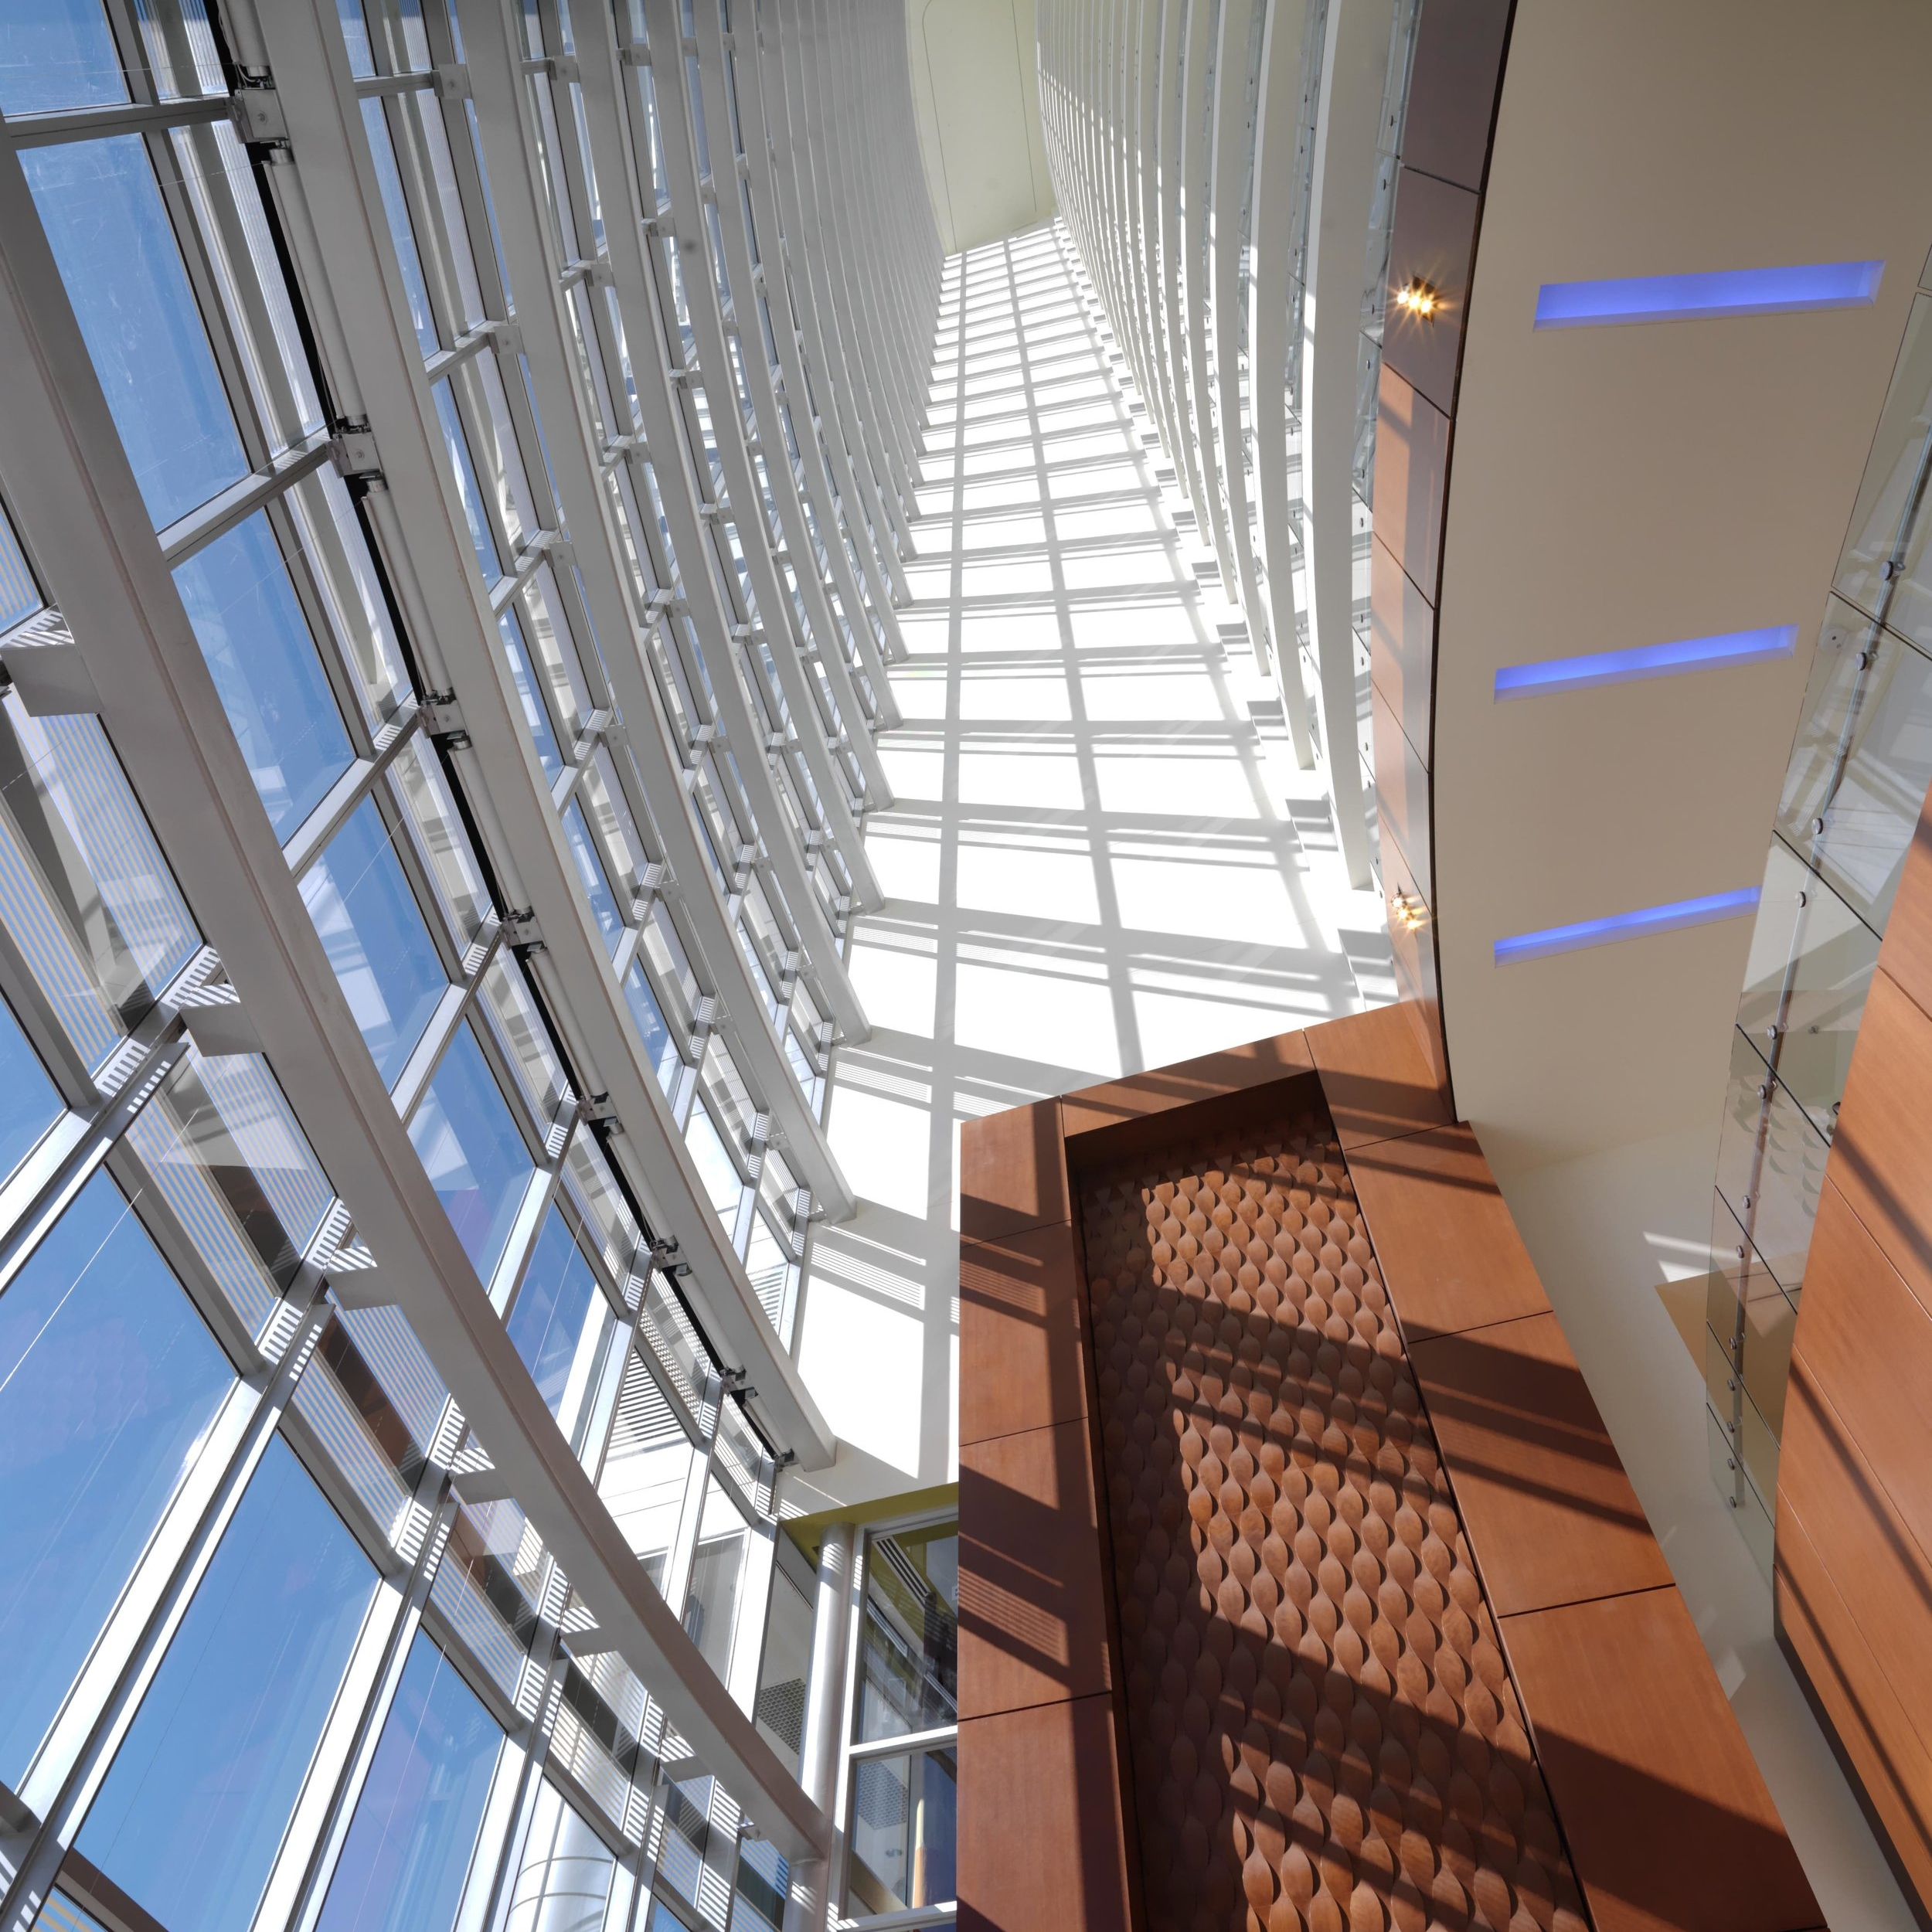 Atrium-Up-View-Day.jpg